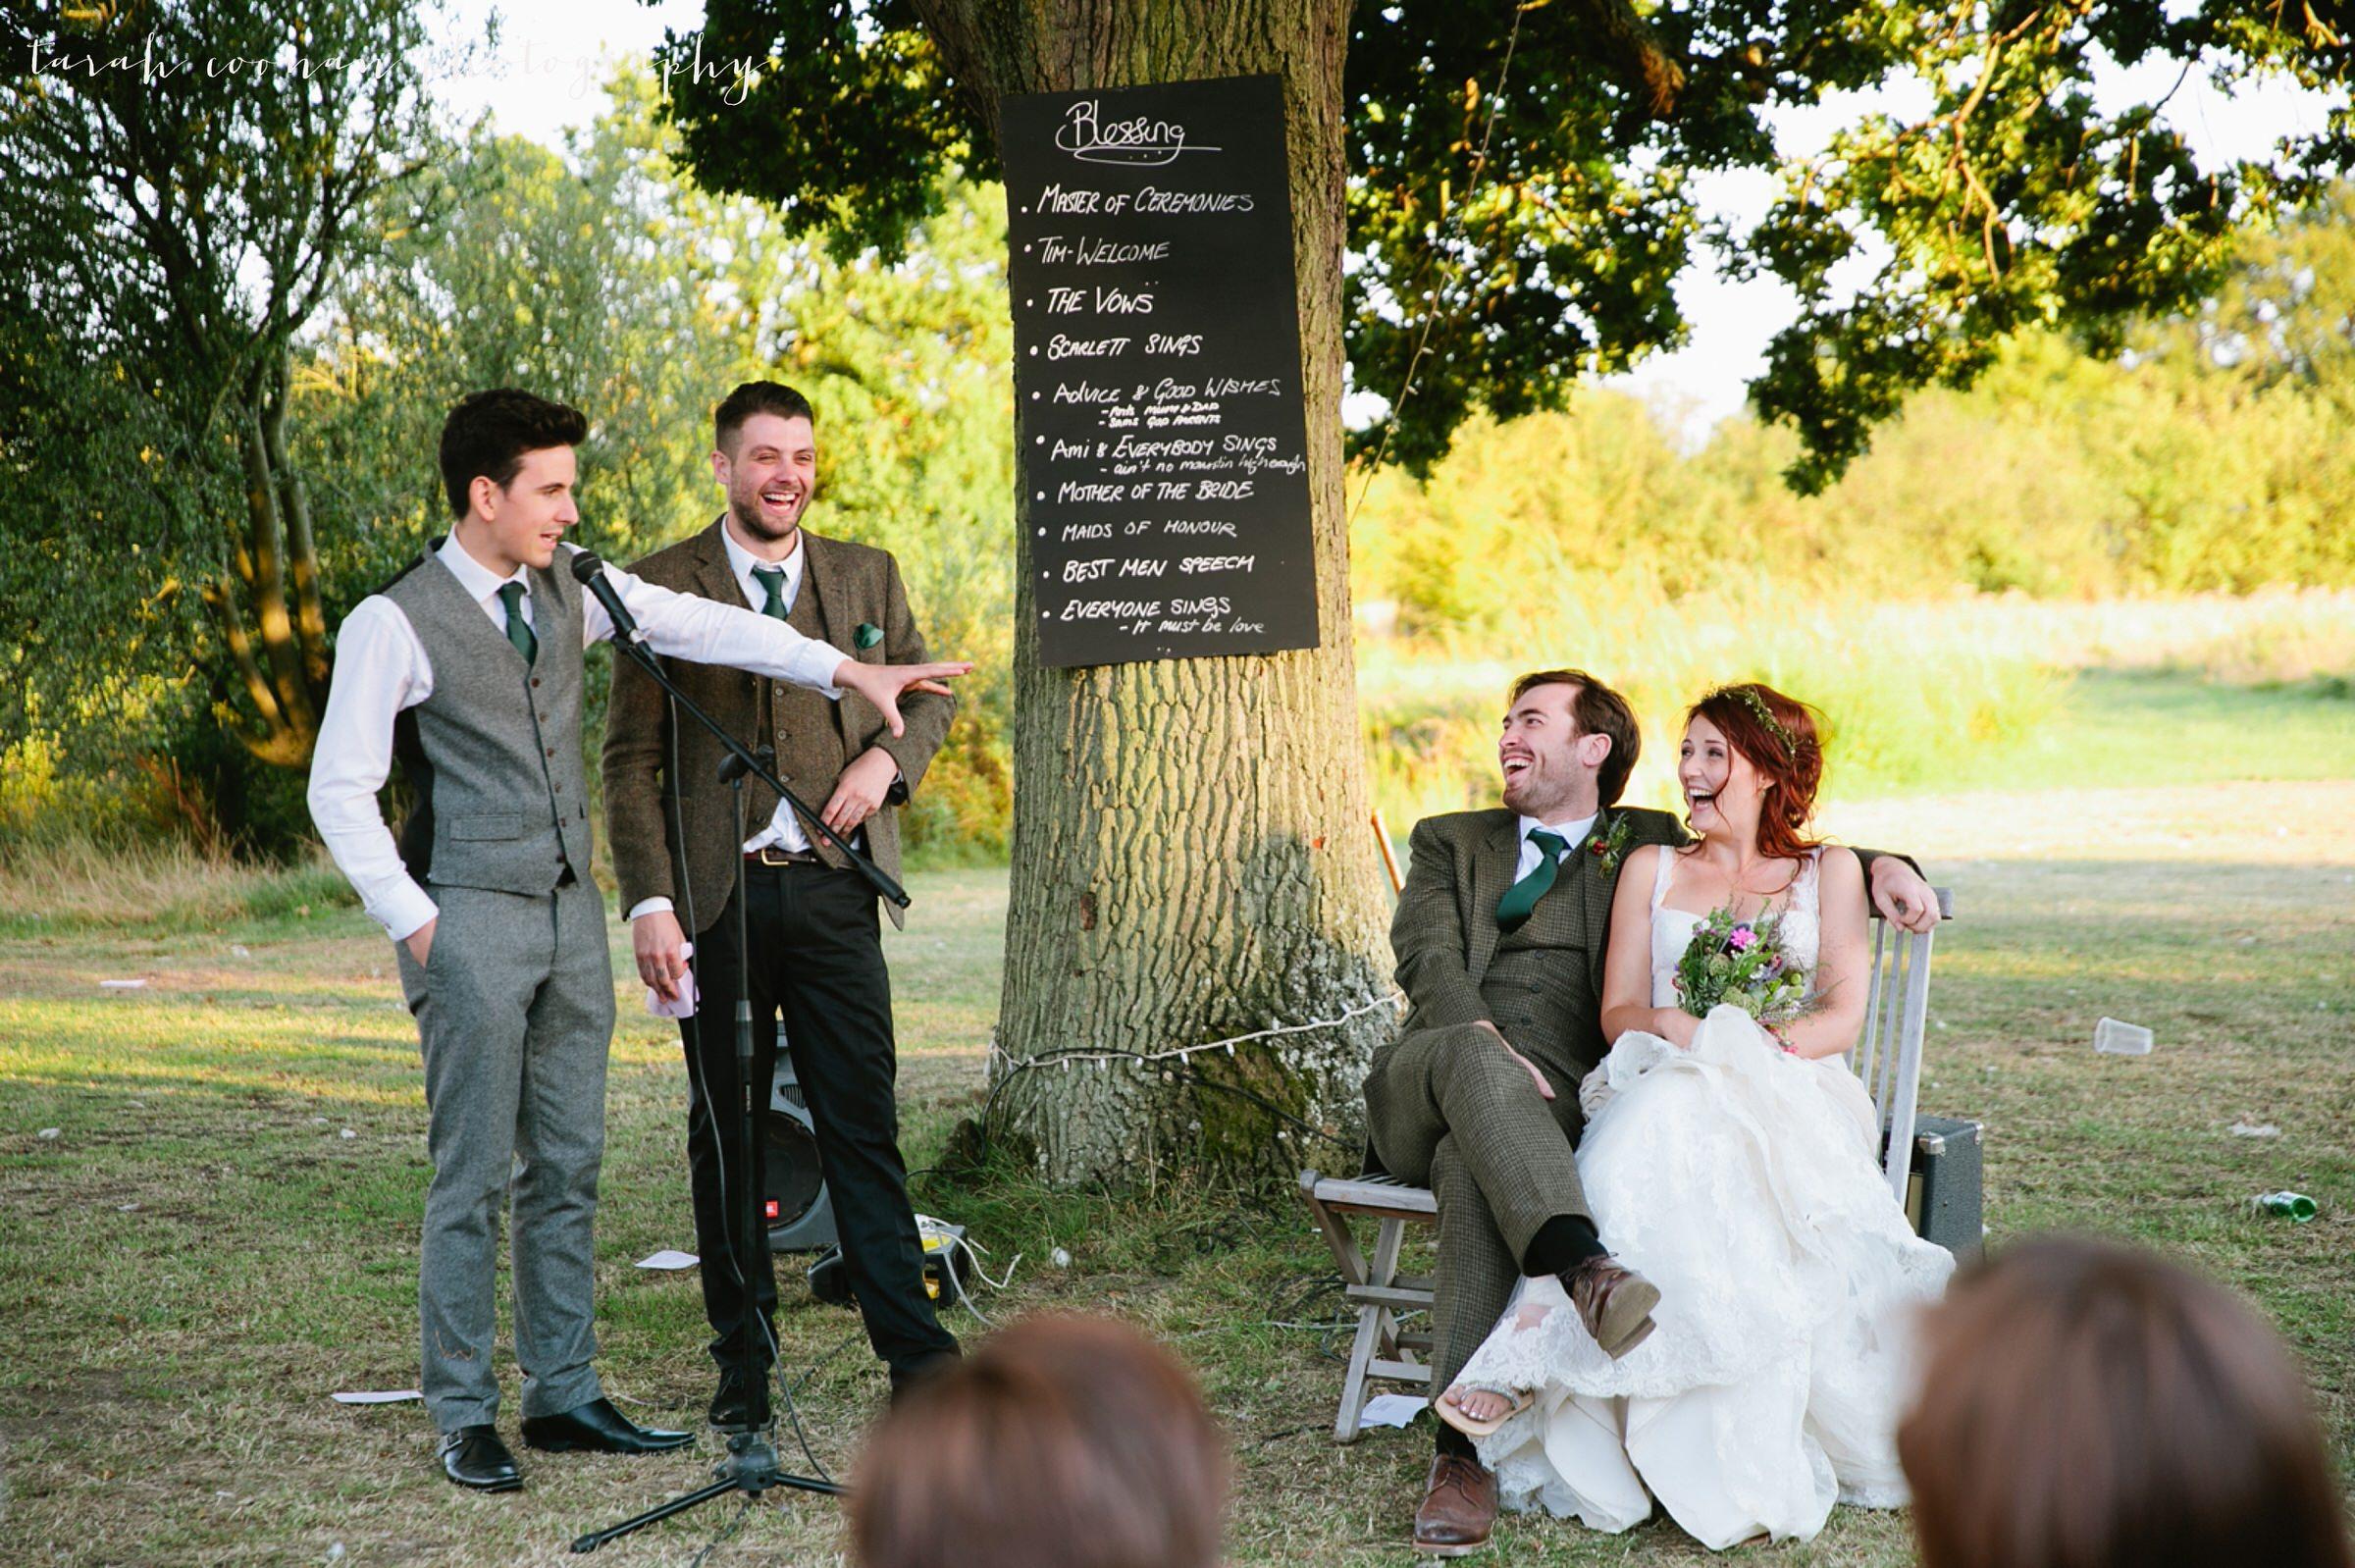 brighton-wedding-photographer80